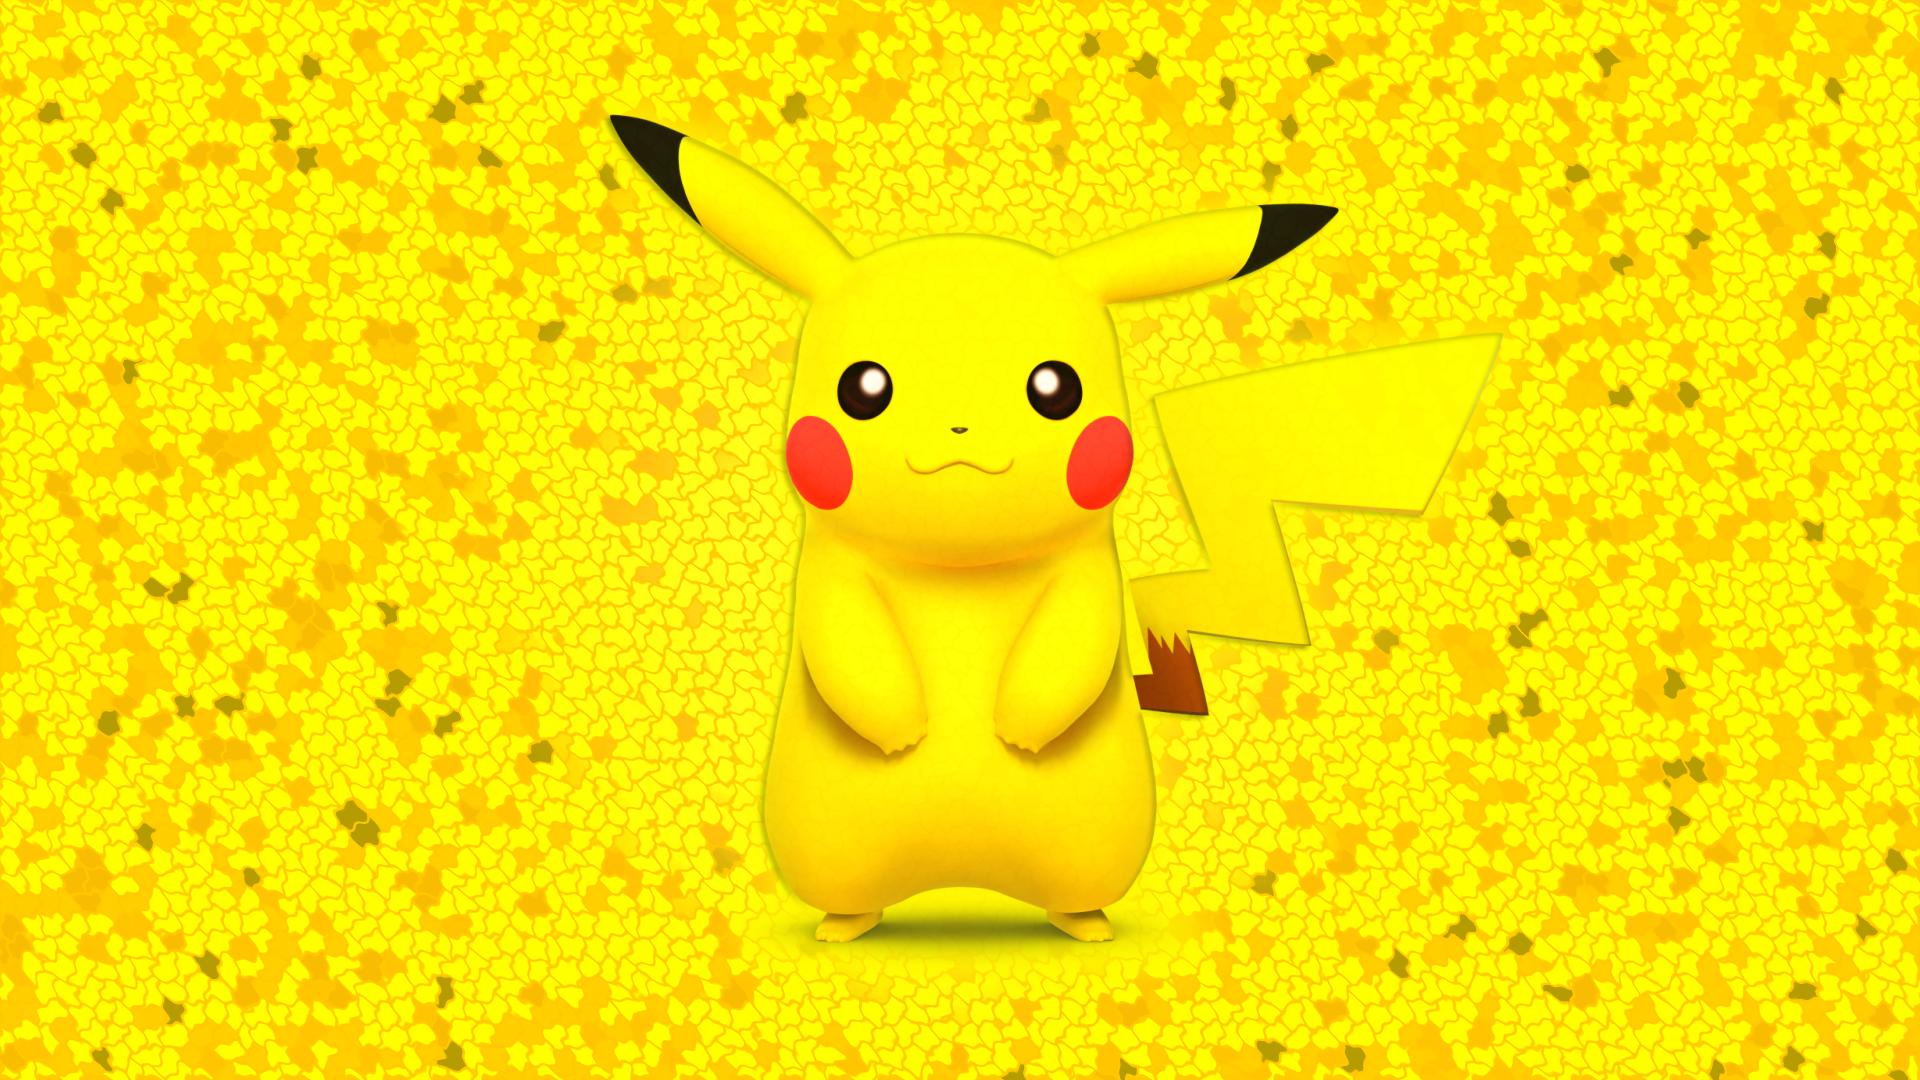 Pikachu Wallpapers HD